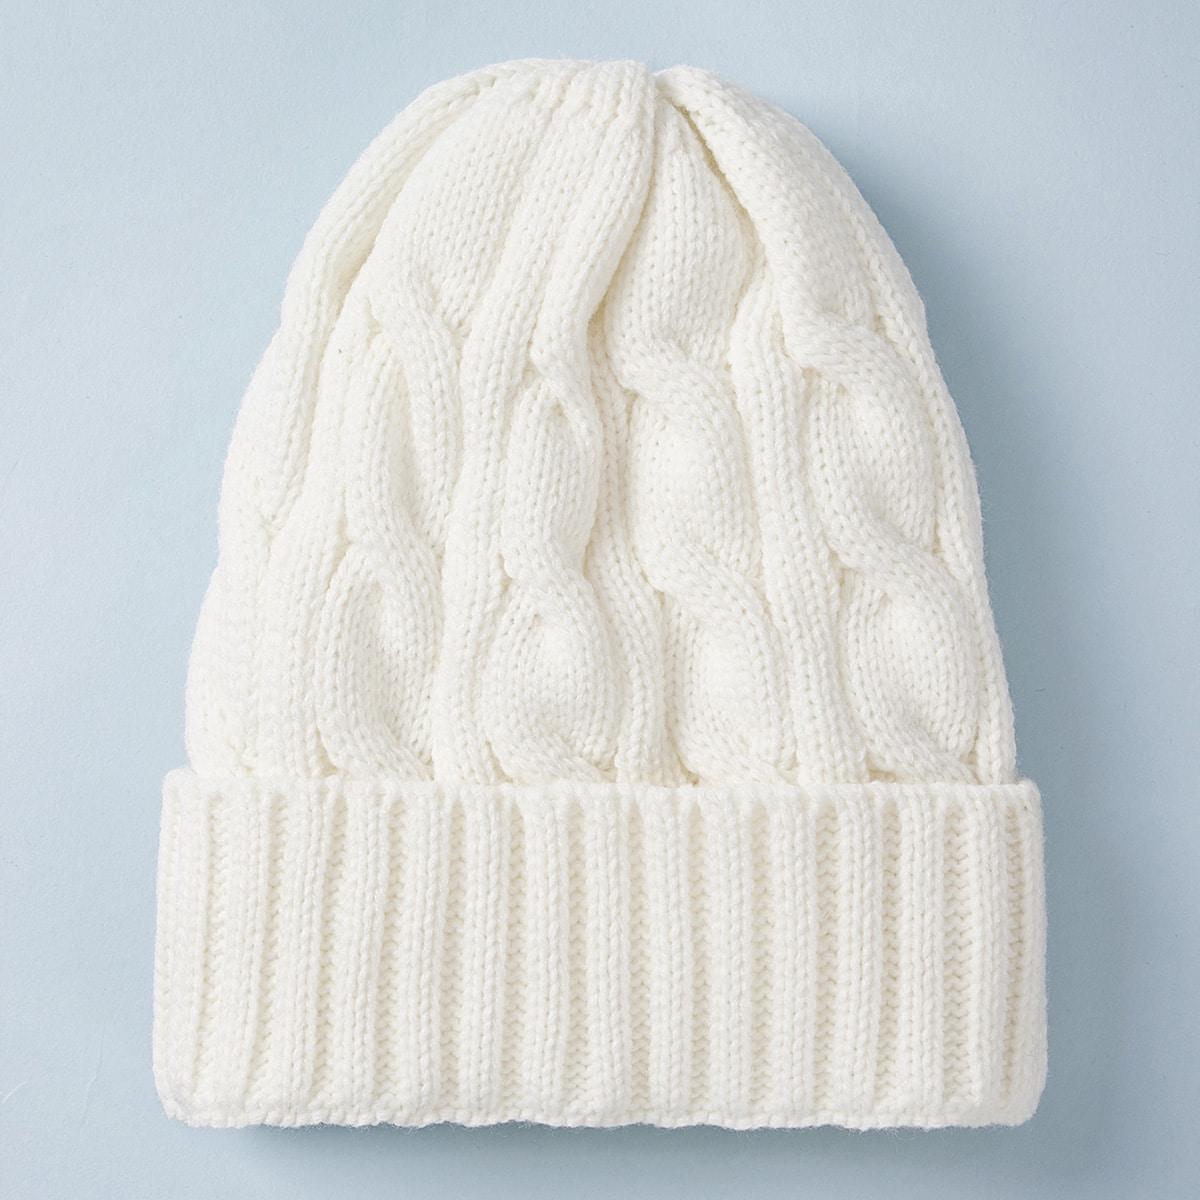 Однотонная шапка от SHEIN